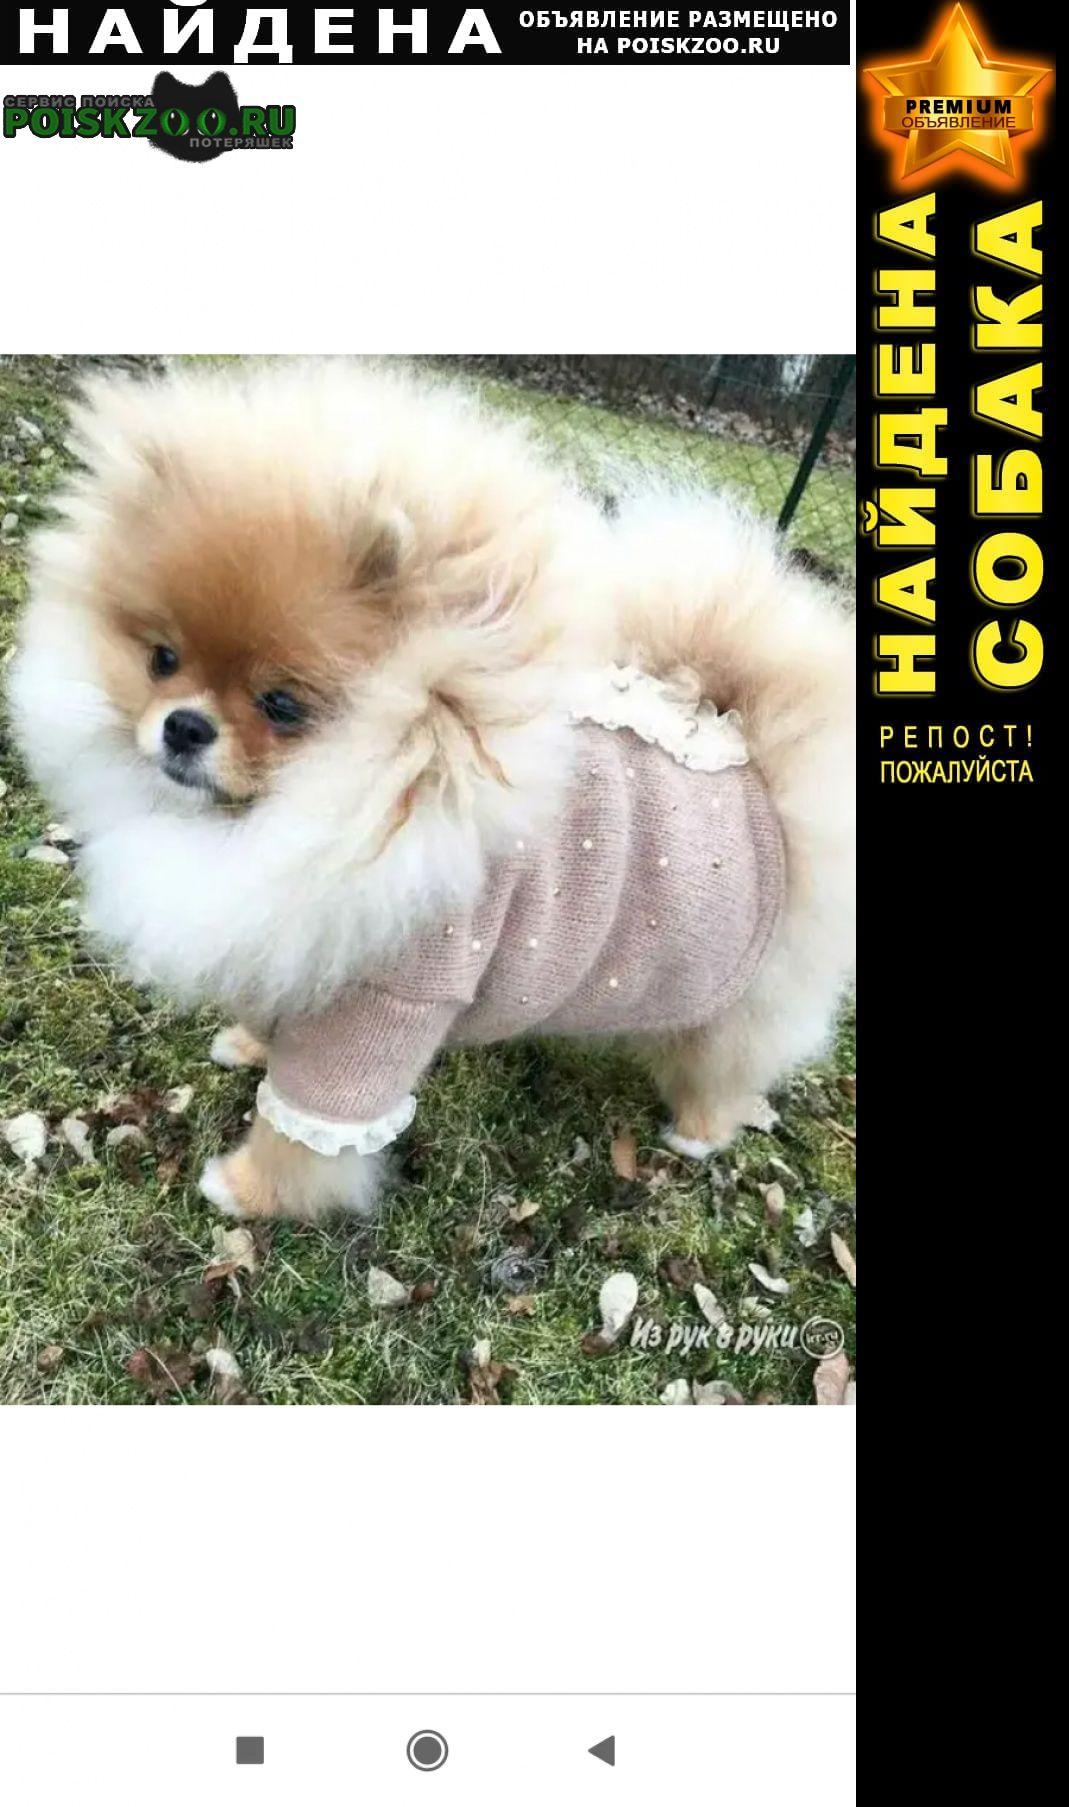 Найдена собака кобель шпиц Санкт-Петербург